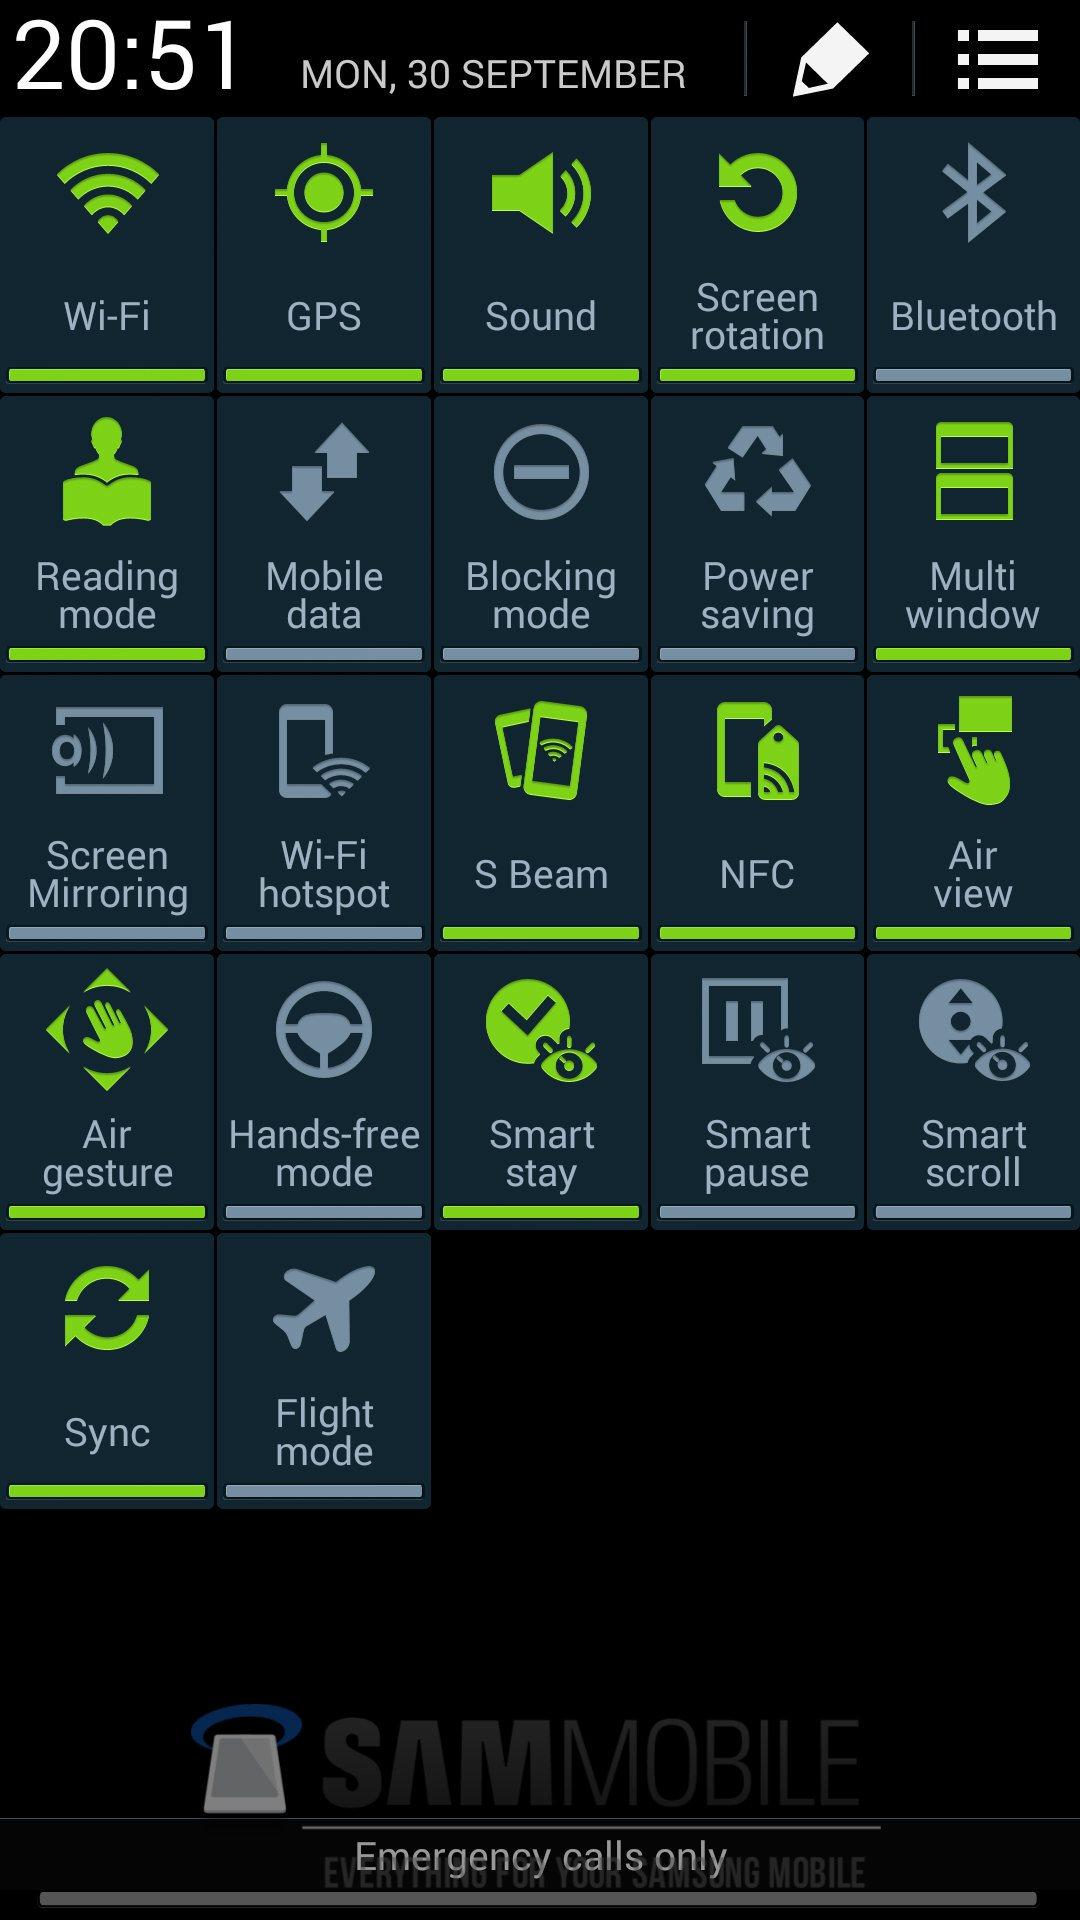 Android4.3_Samsung_Galaxy_S4_XXUEMI8 (2)